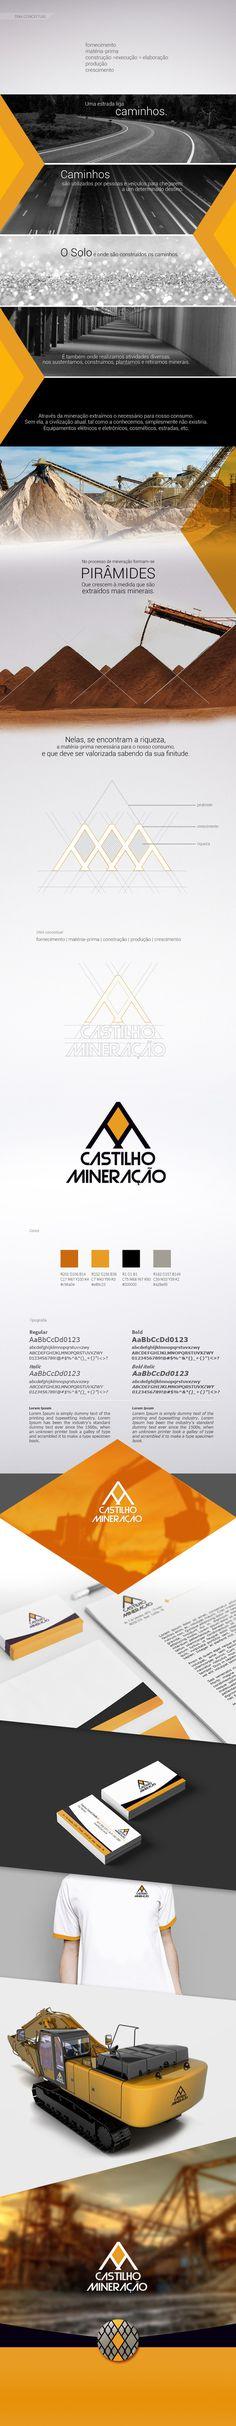 Castilho Mineração - marianapoczapski #identity #logo #construction